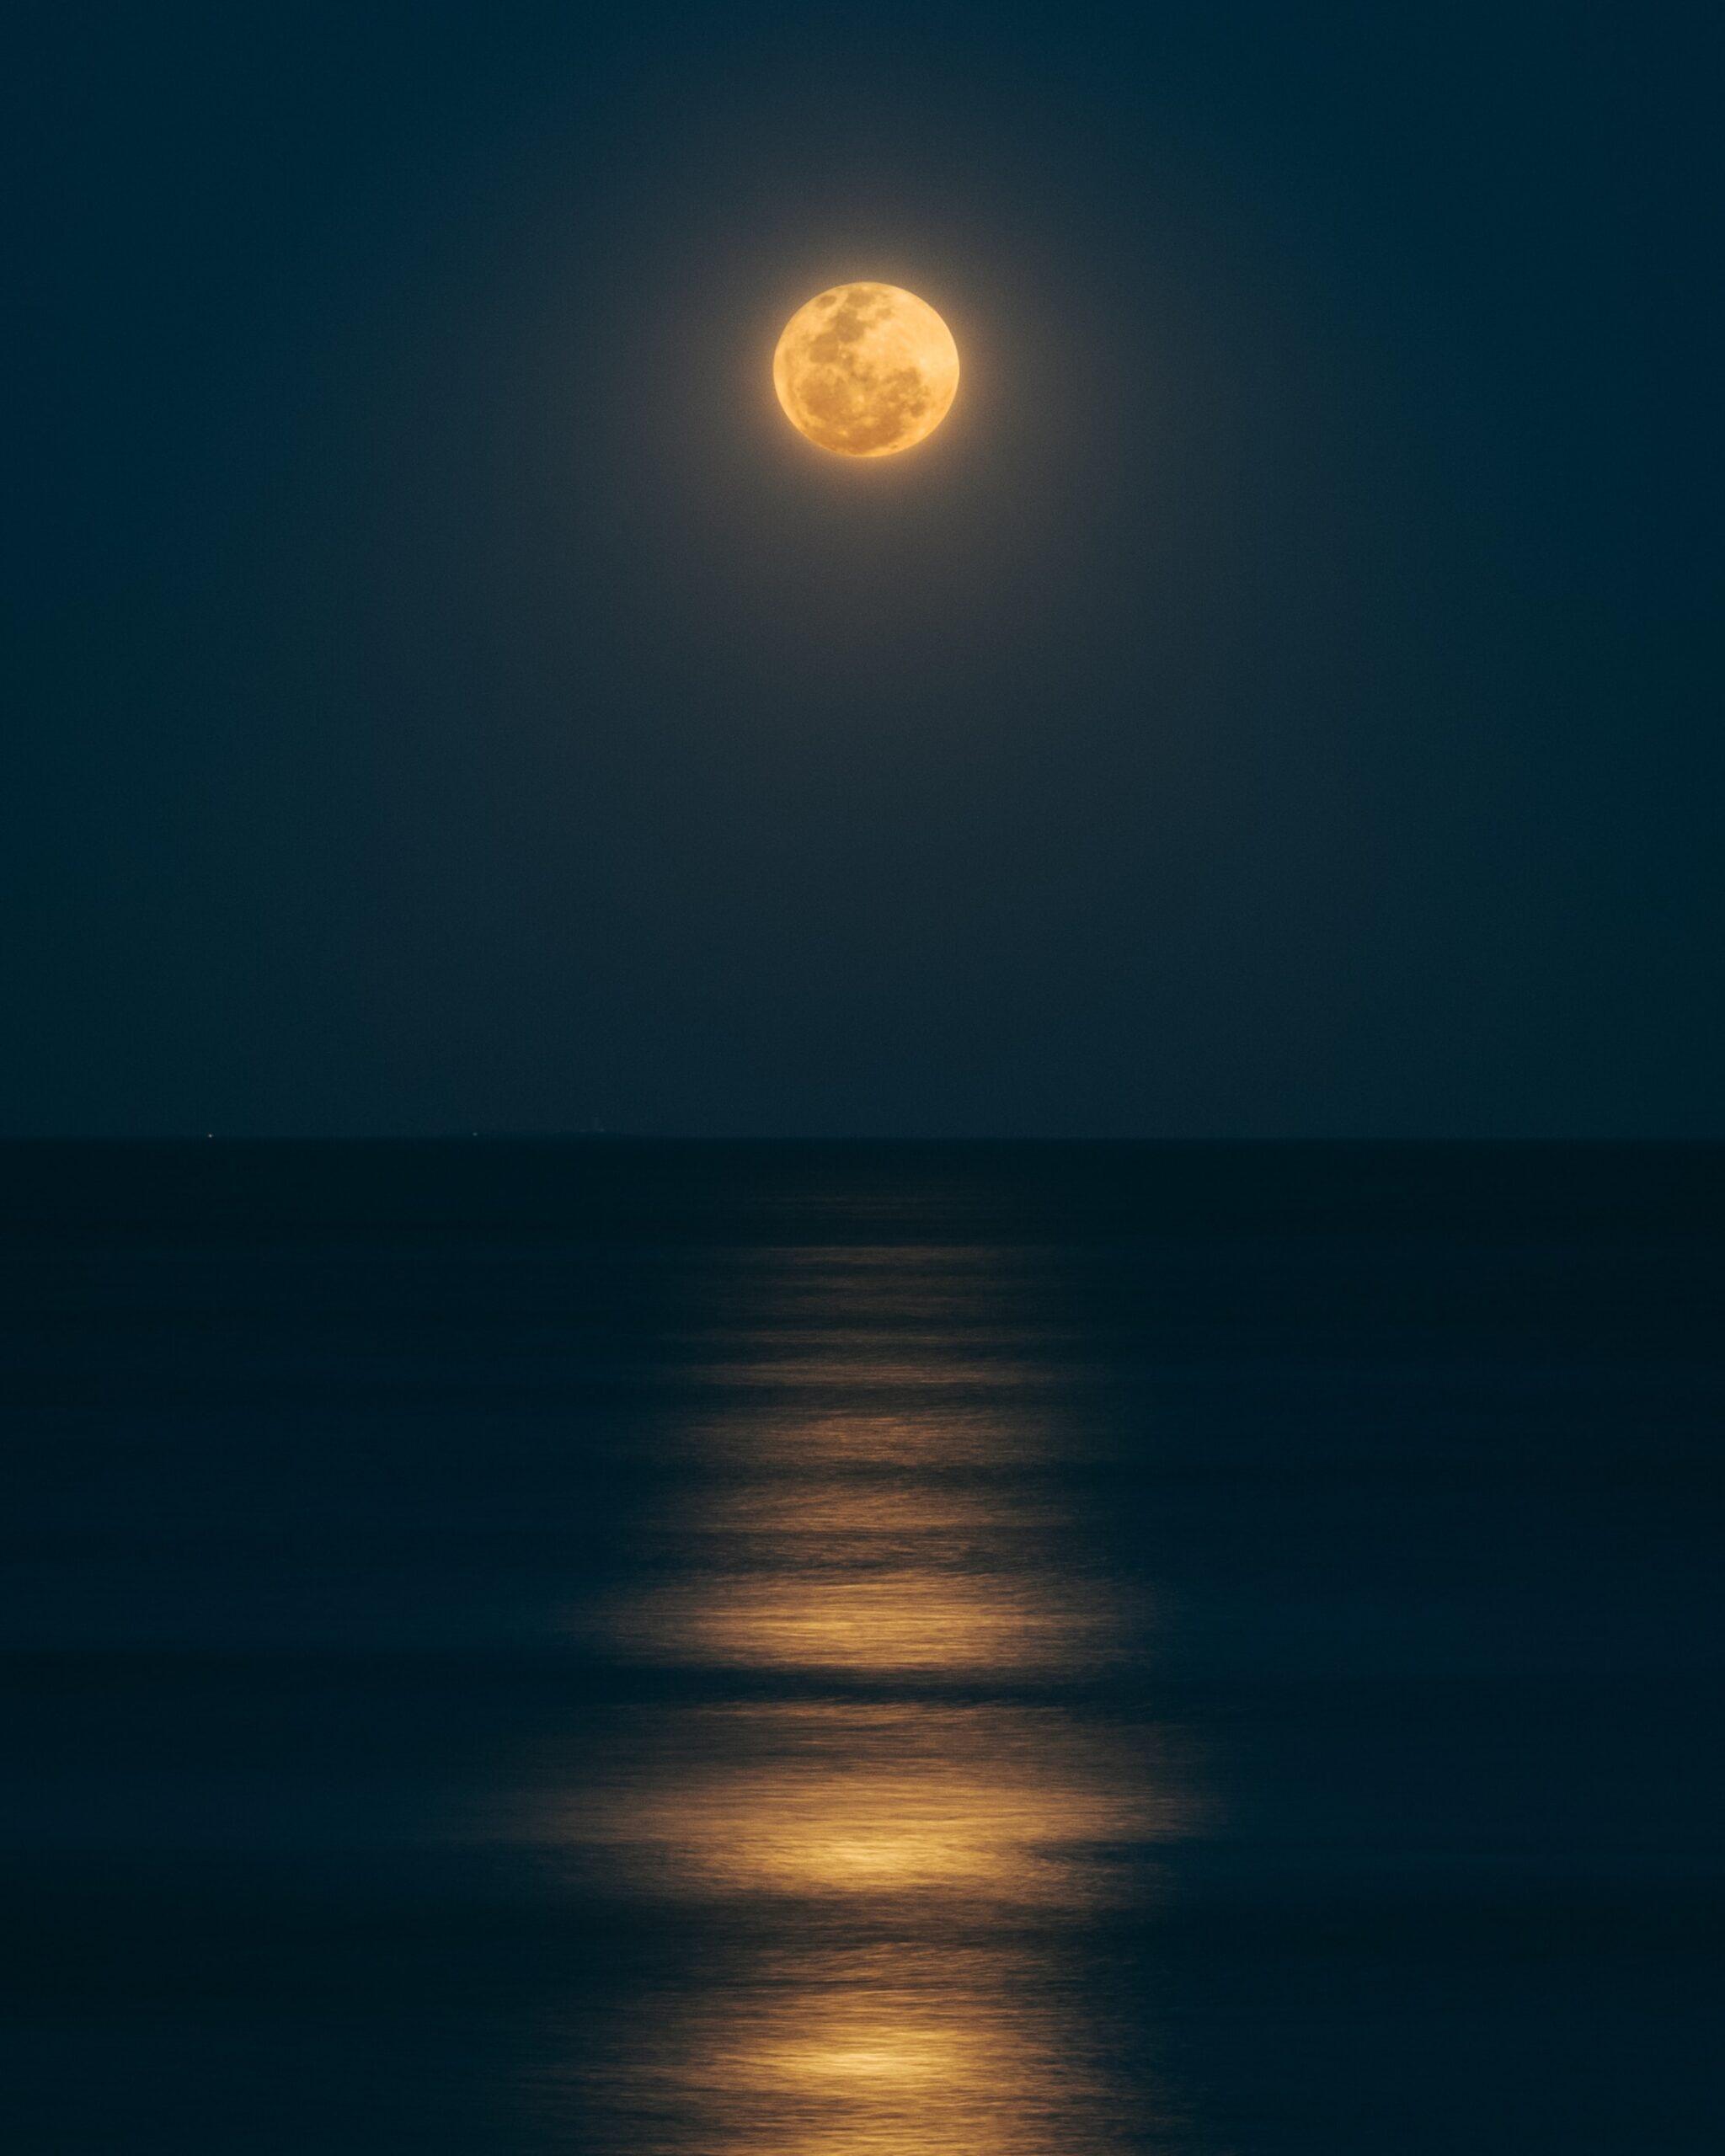 guzman-barquin-full moonlight over ocean-unsplash